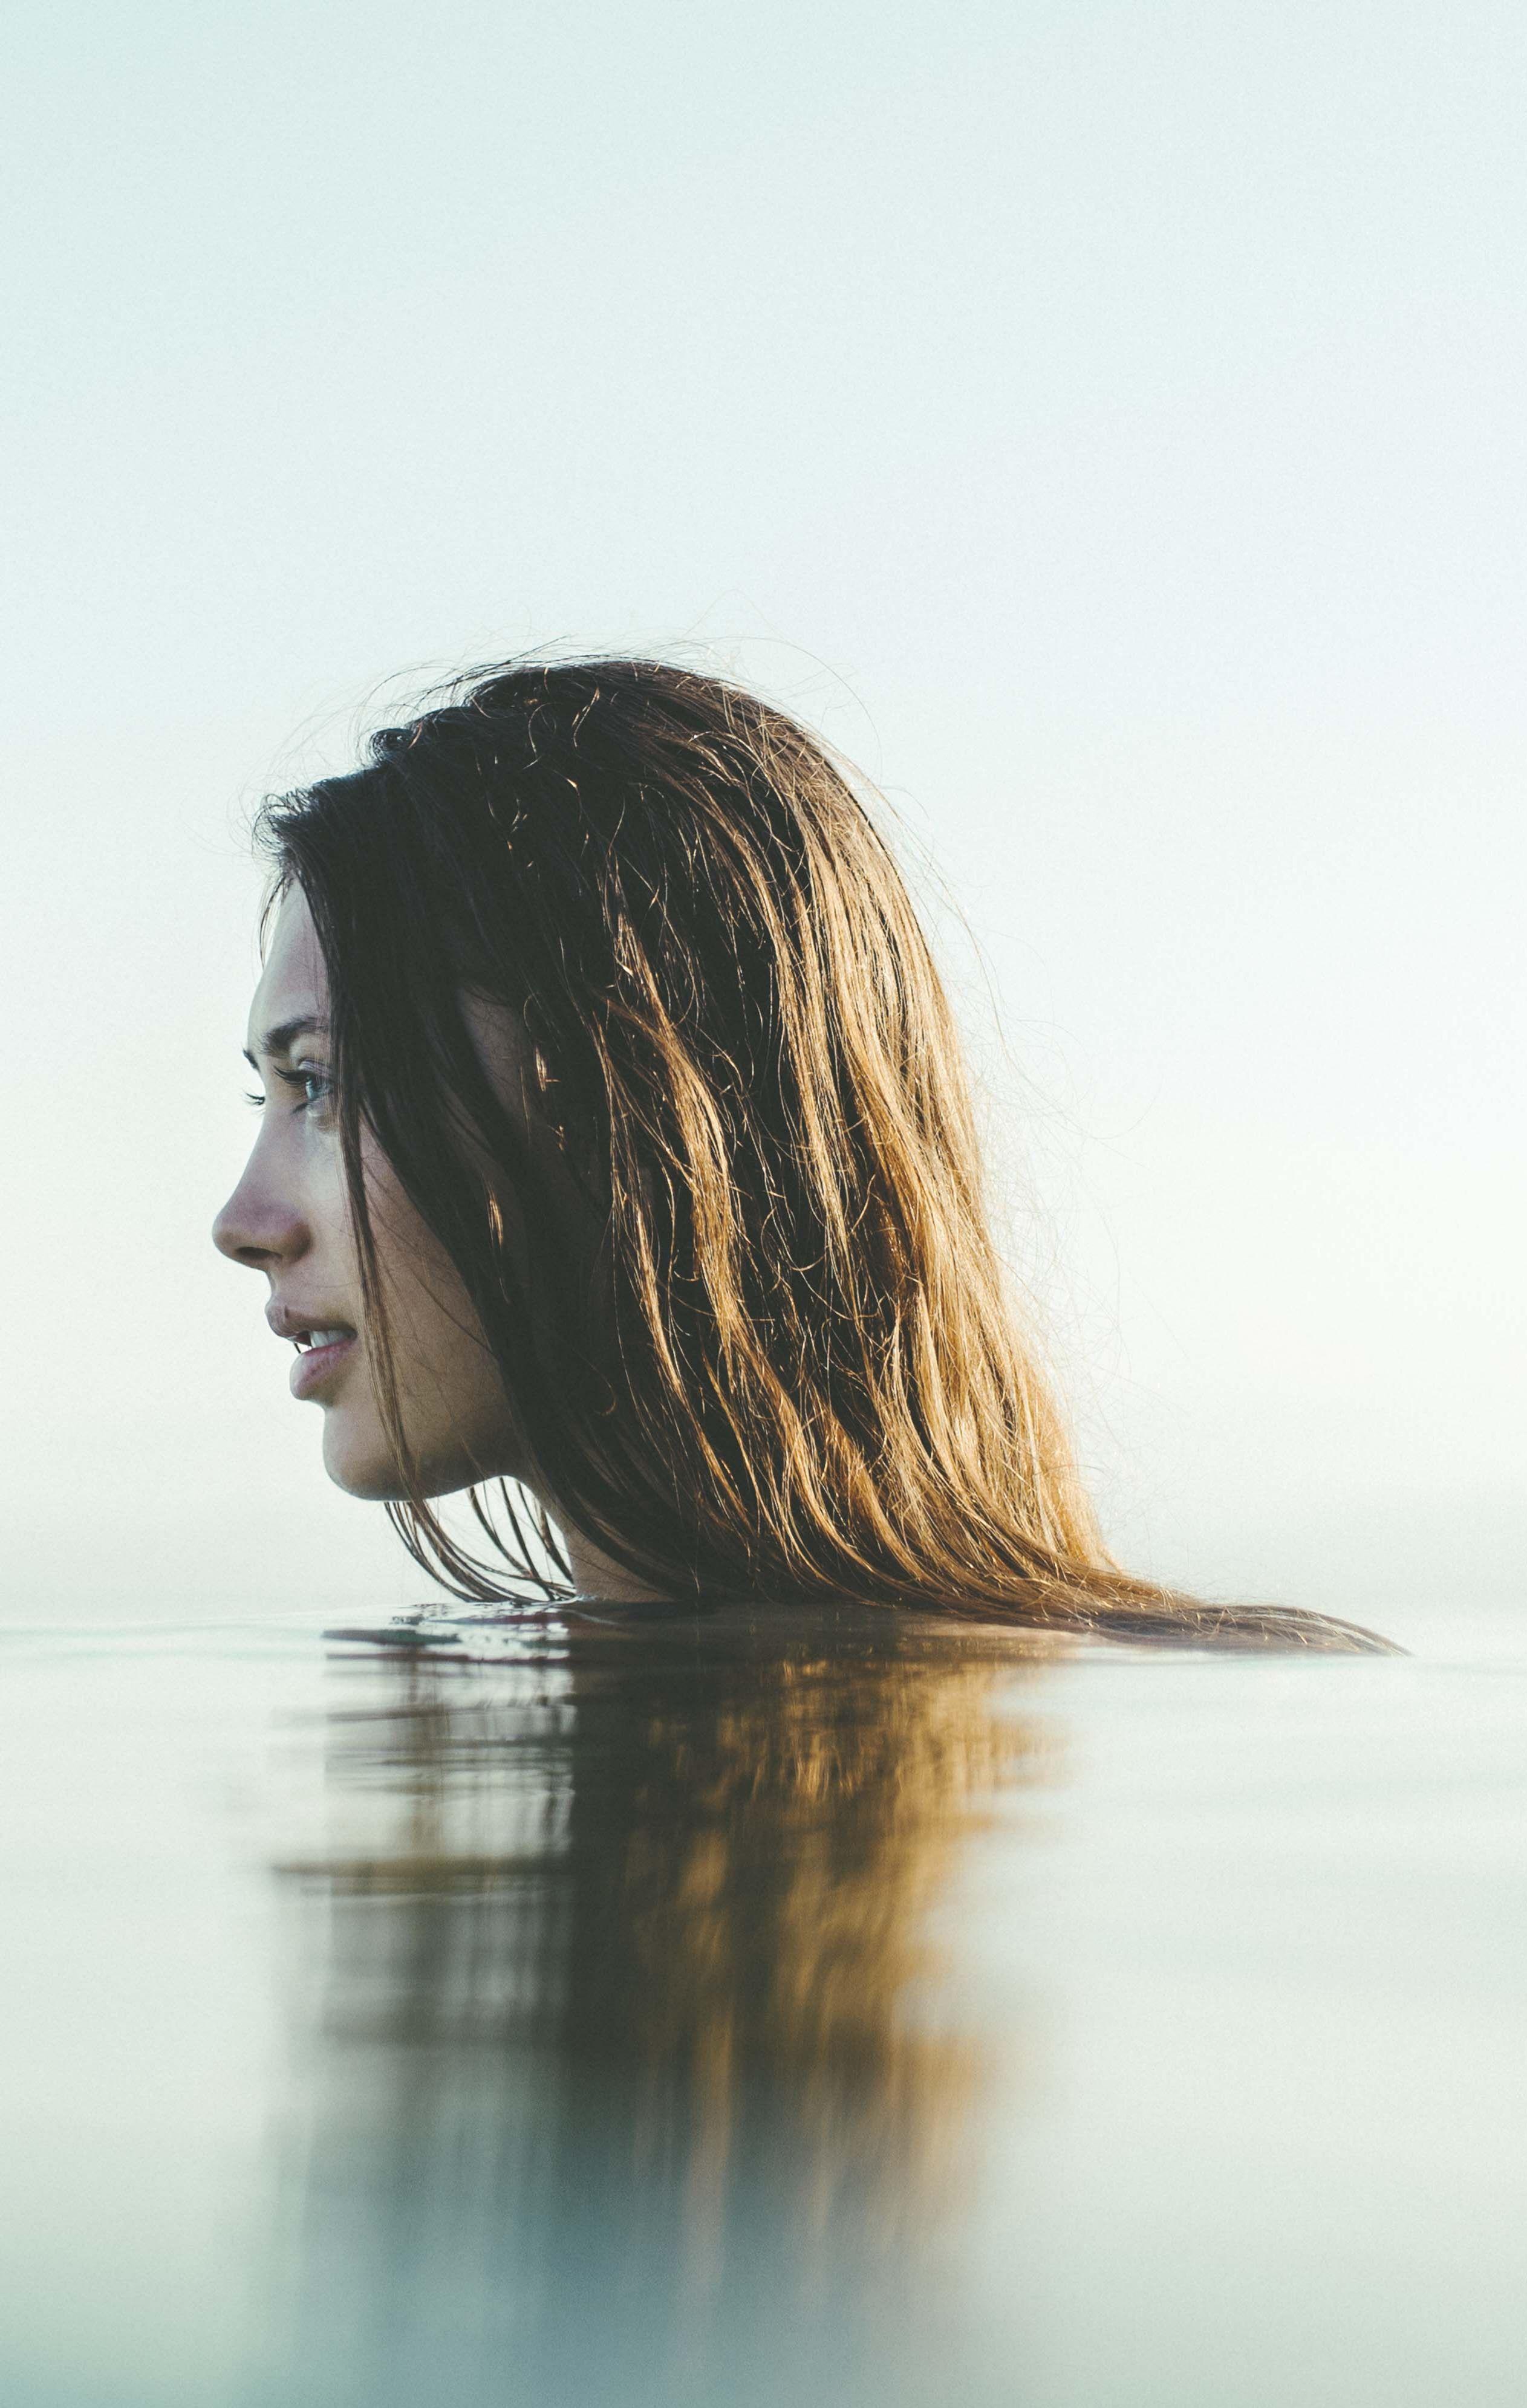 Pin by Marsela Shalunts on Фотография | Pinterest | Water activities ...